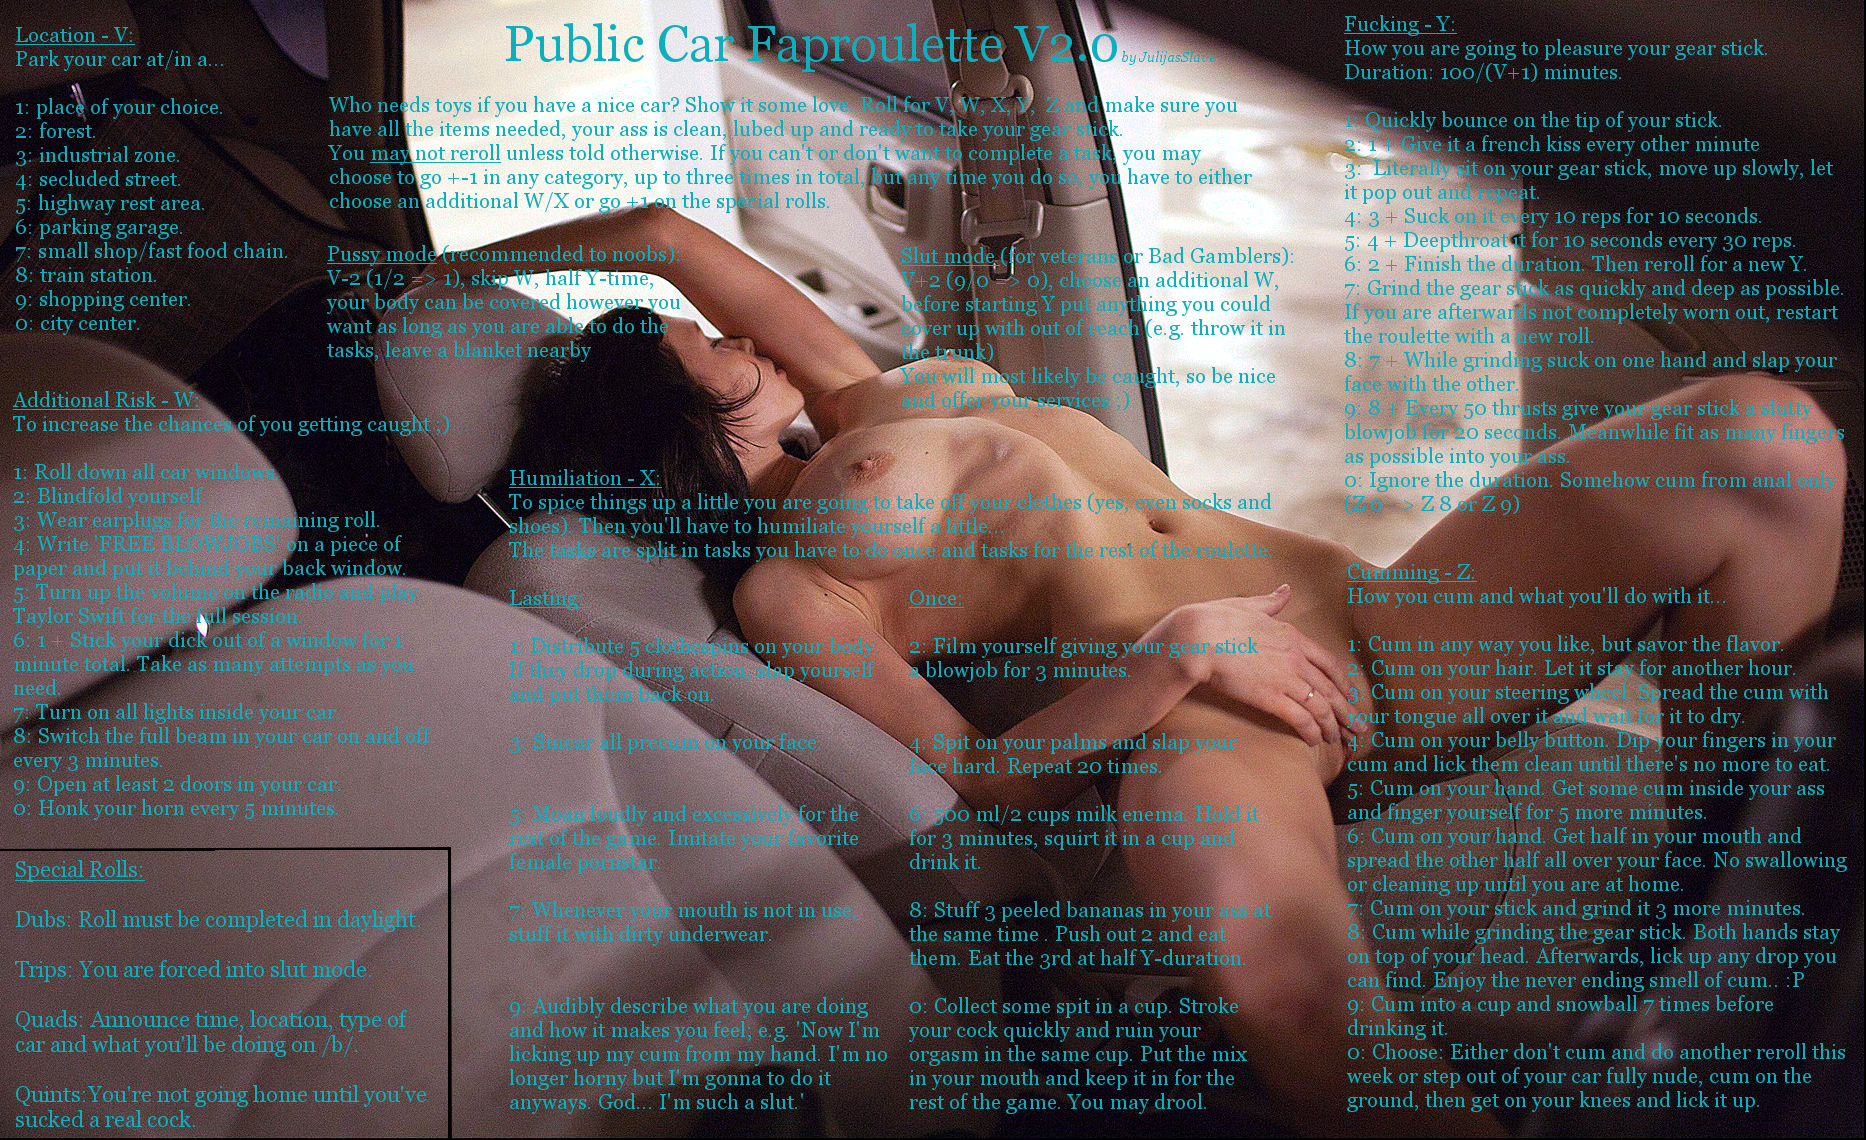 nude in publik faproulette